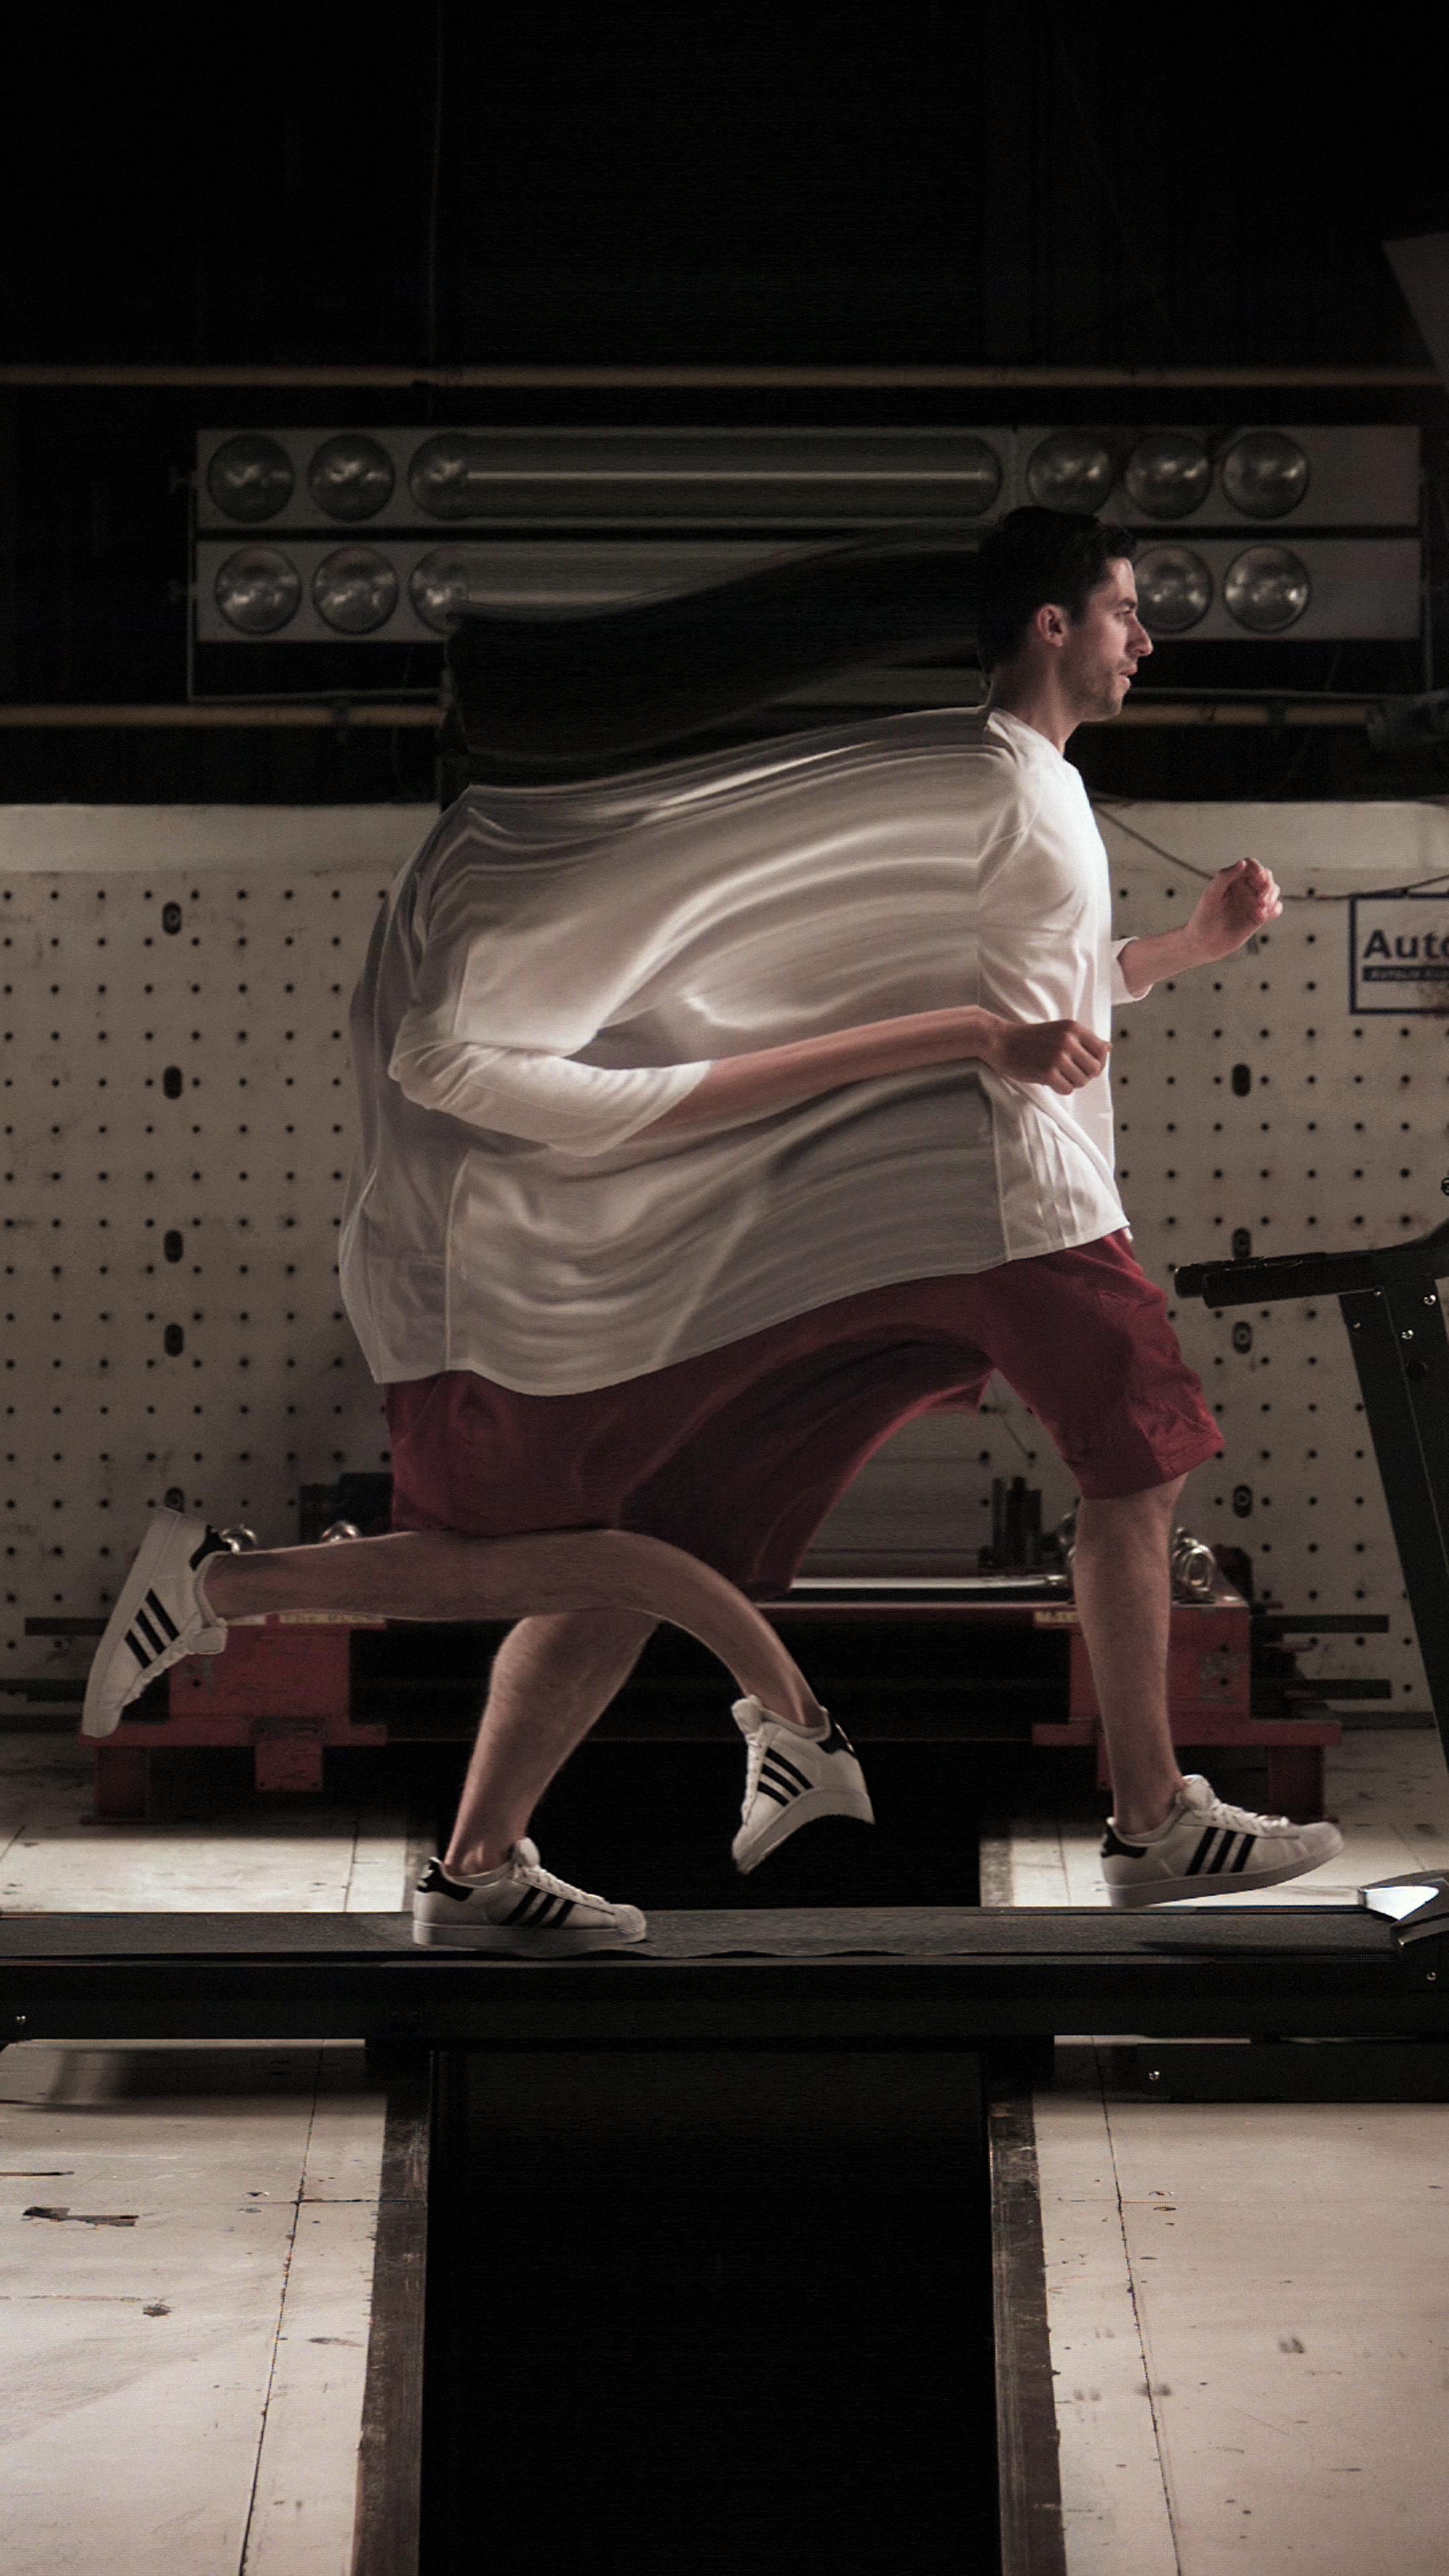 Static No.11(man running) 2008